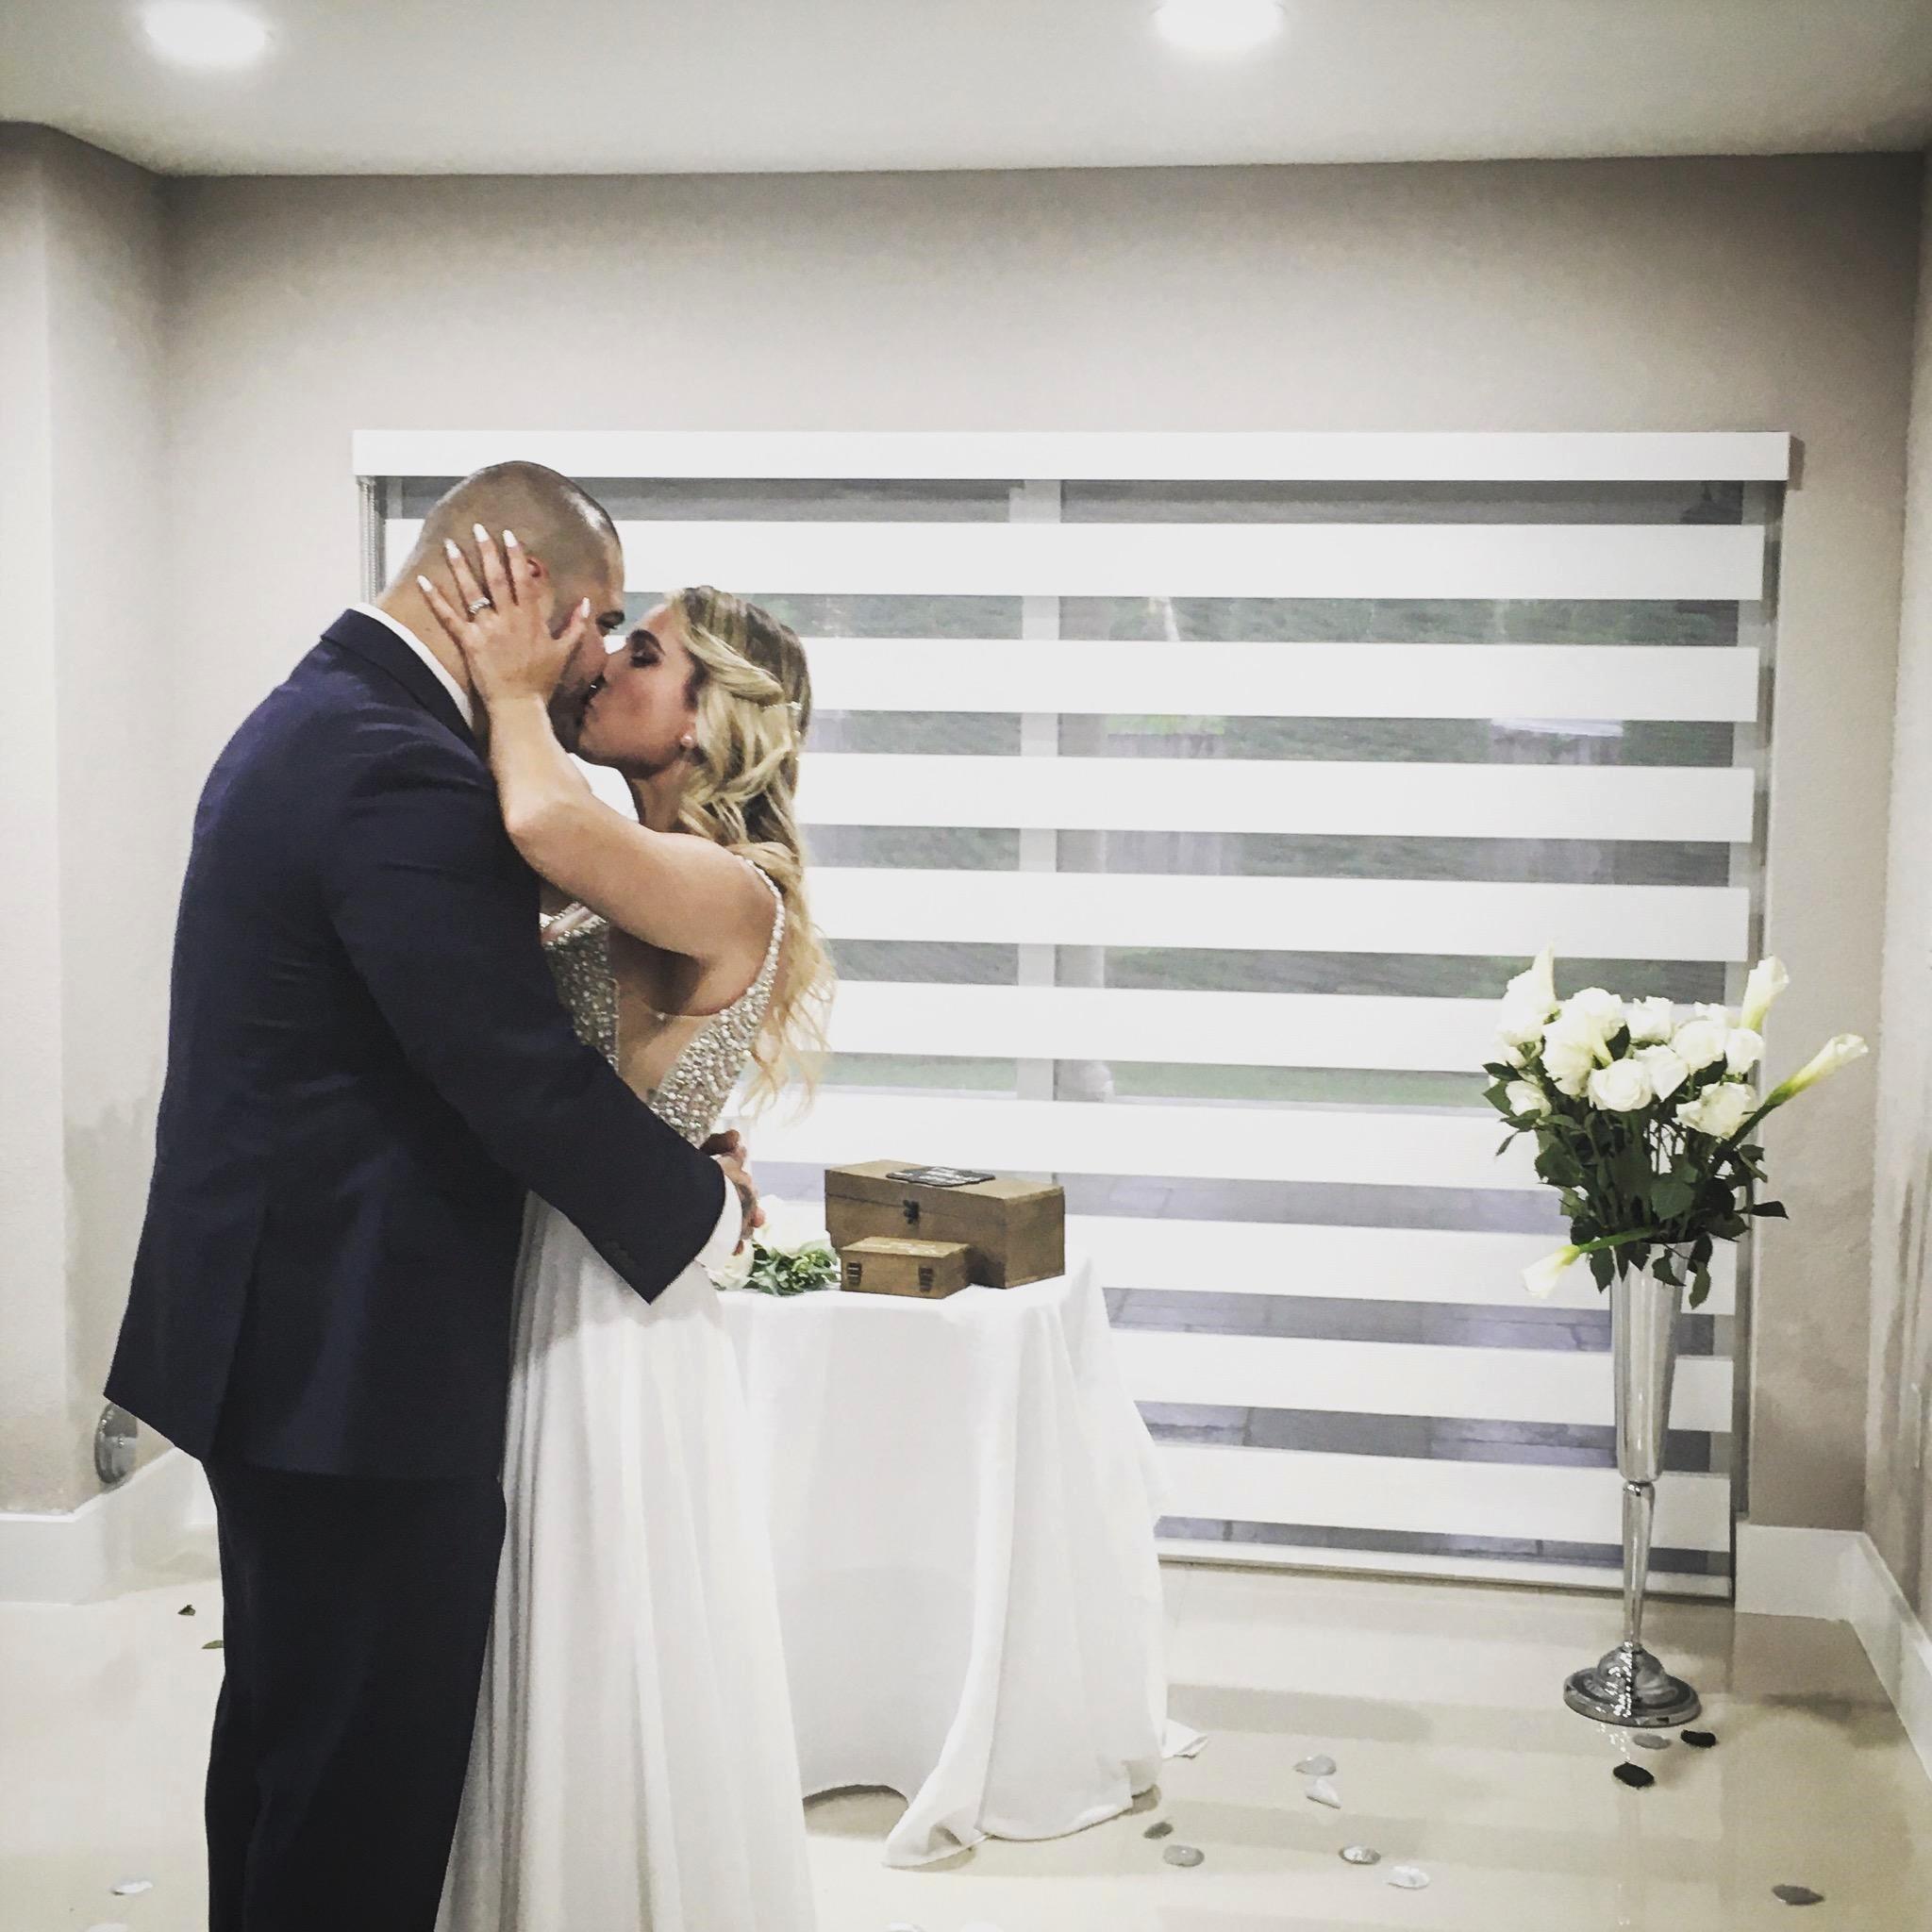 https://0201.nccdn.net/1_2/000/000/19a/ee3/bride-and-grppm-in-miami.jpg